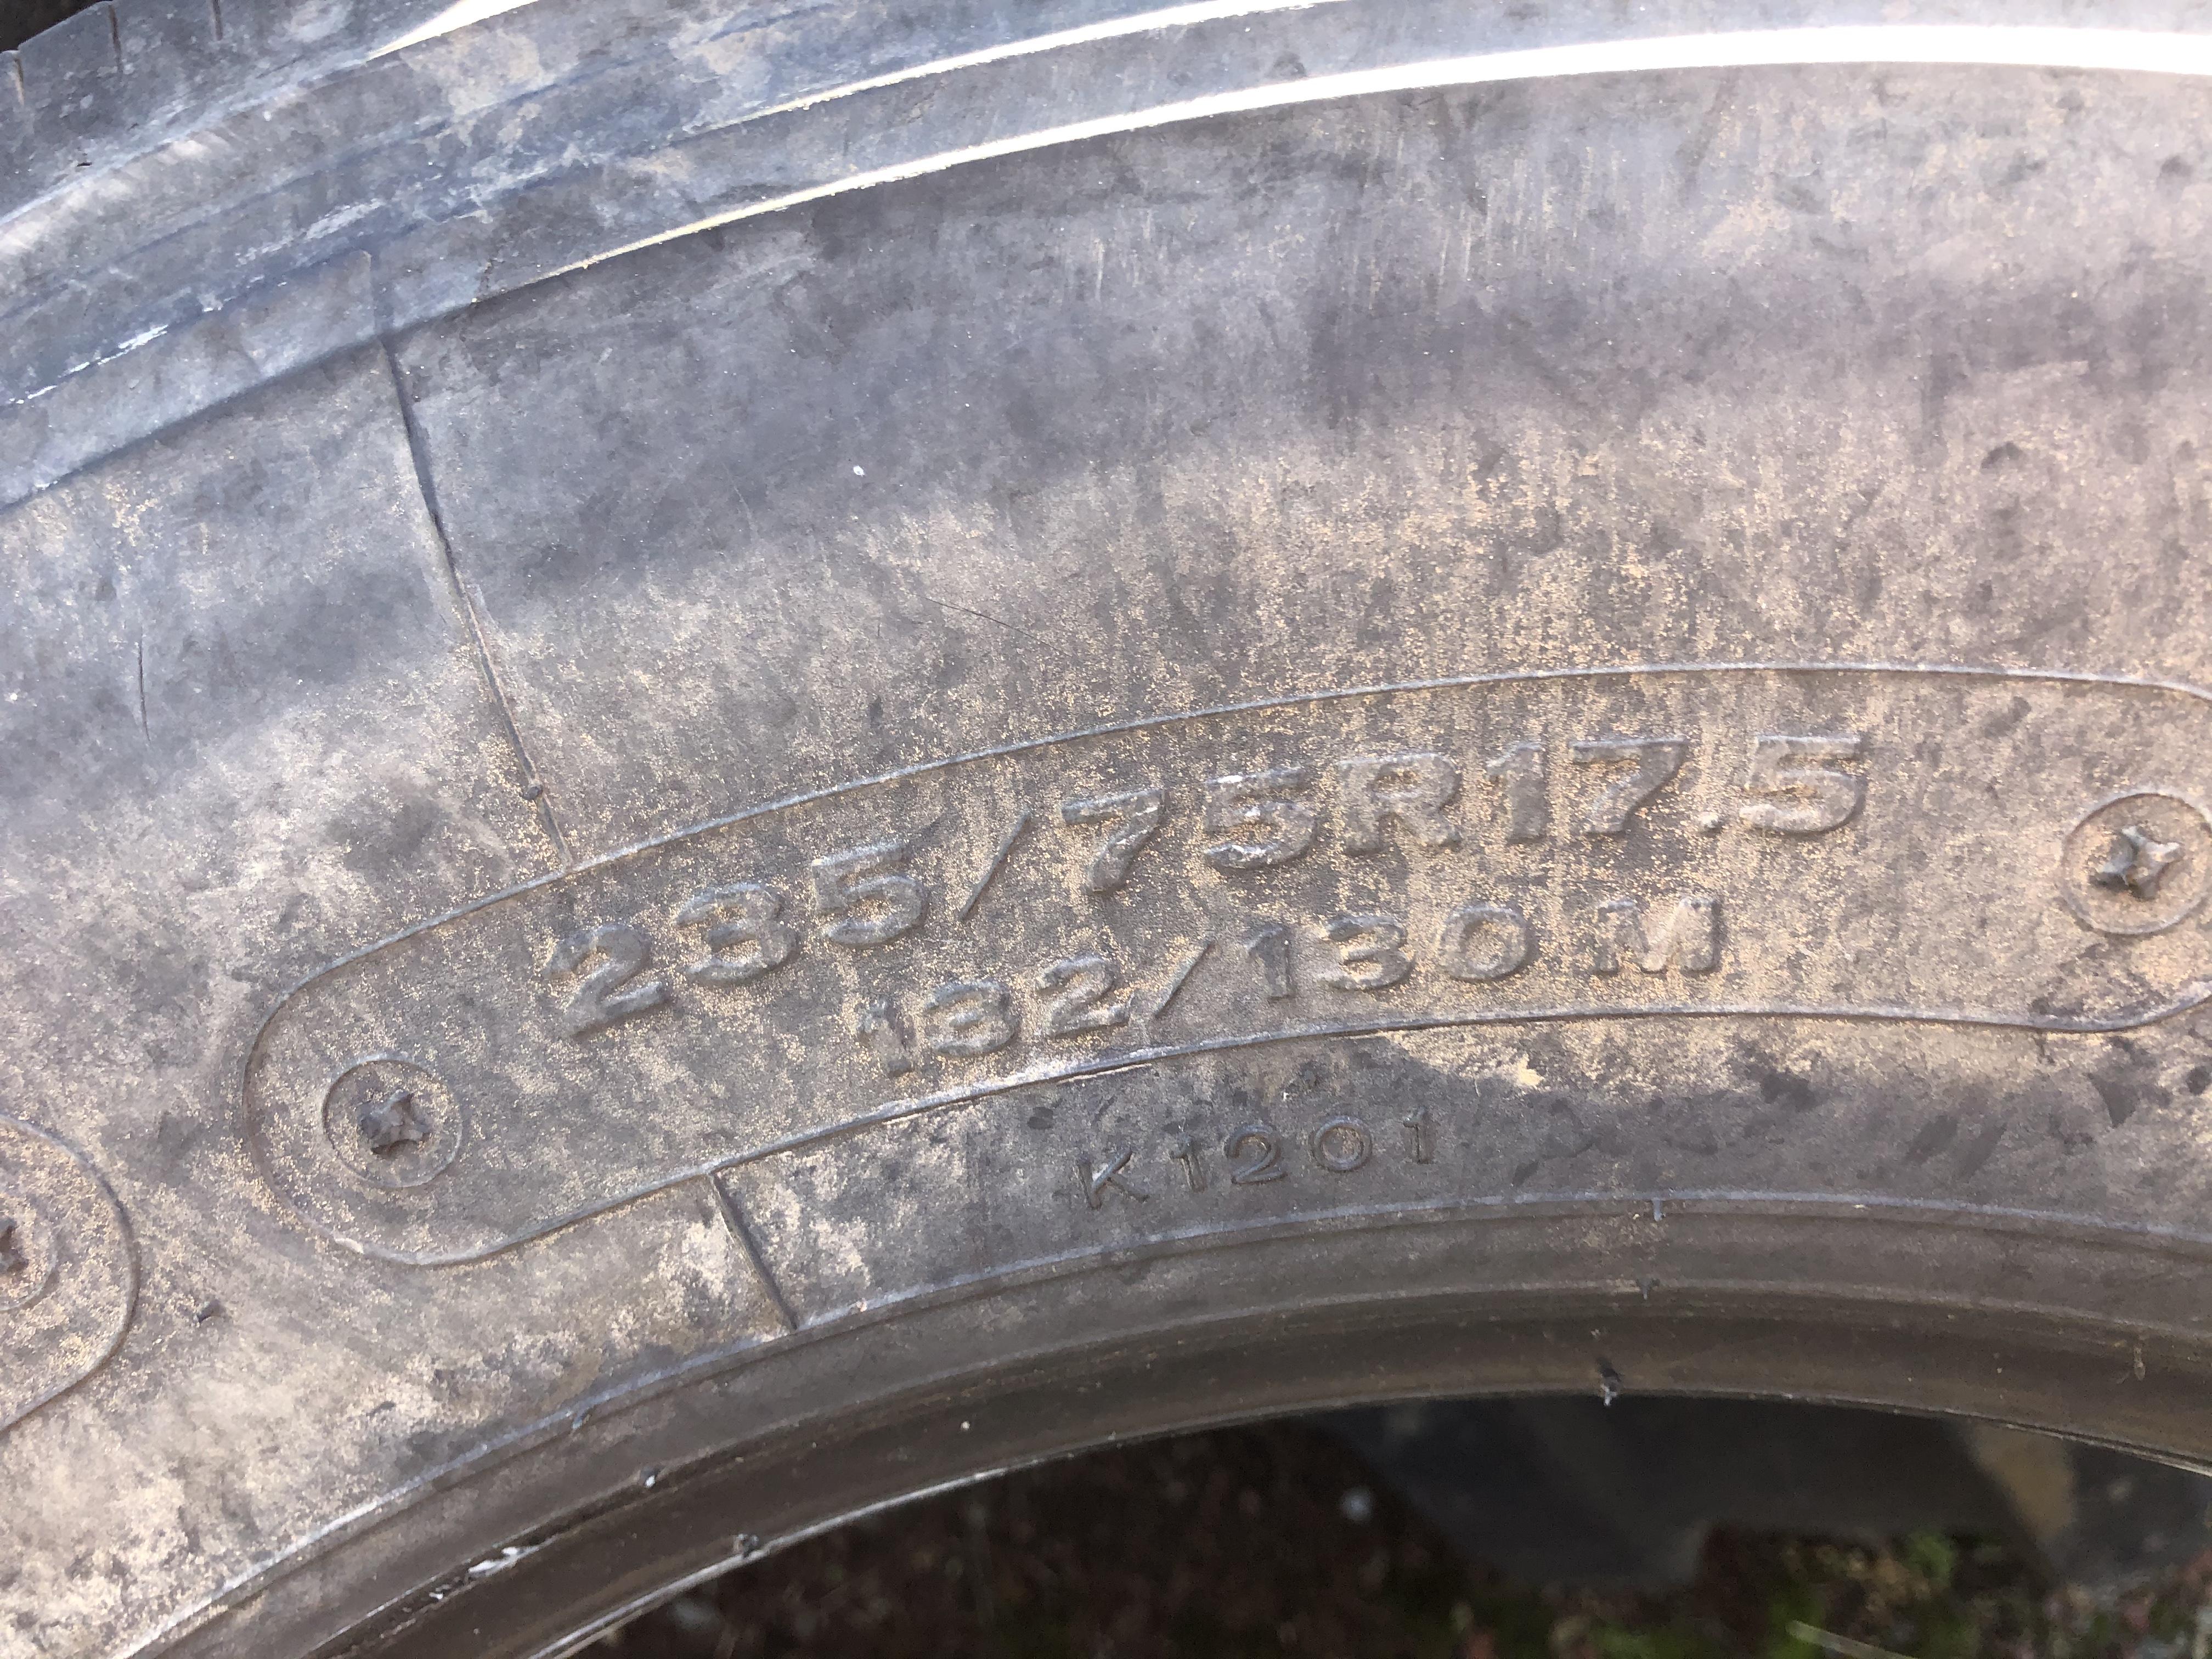 235/75R17.5 Bridgestone 294